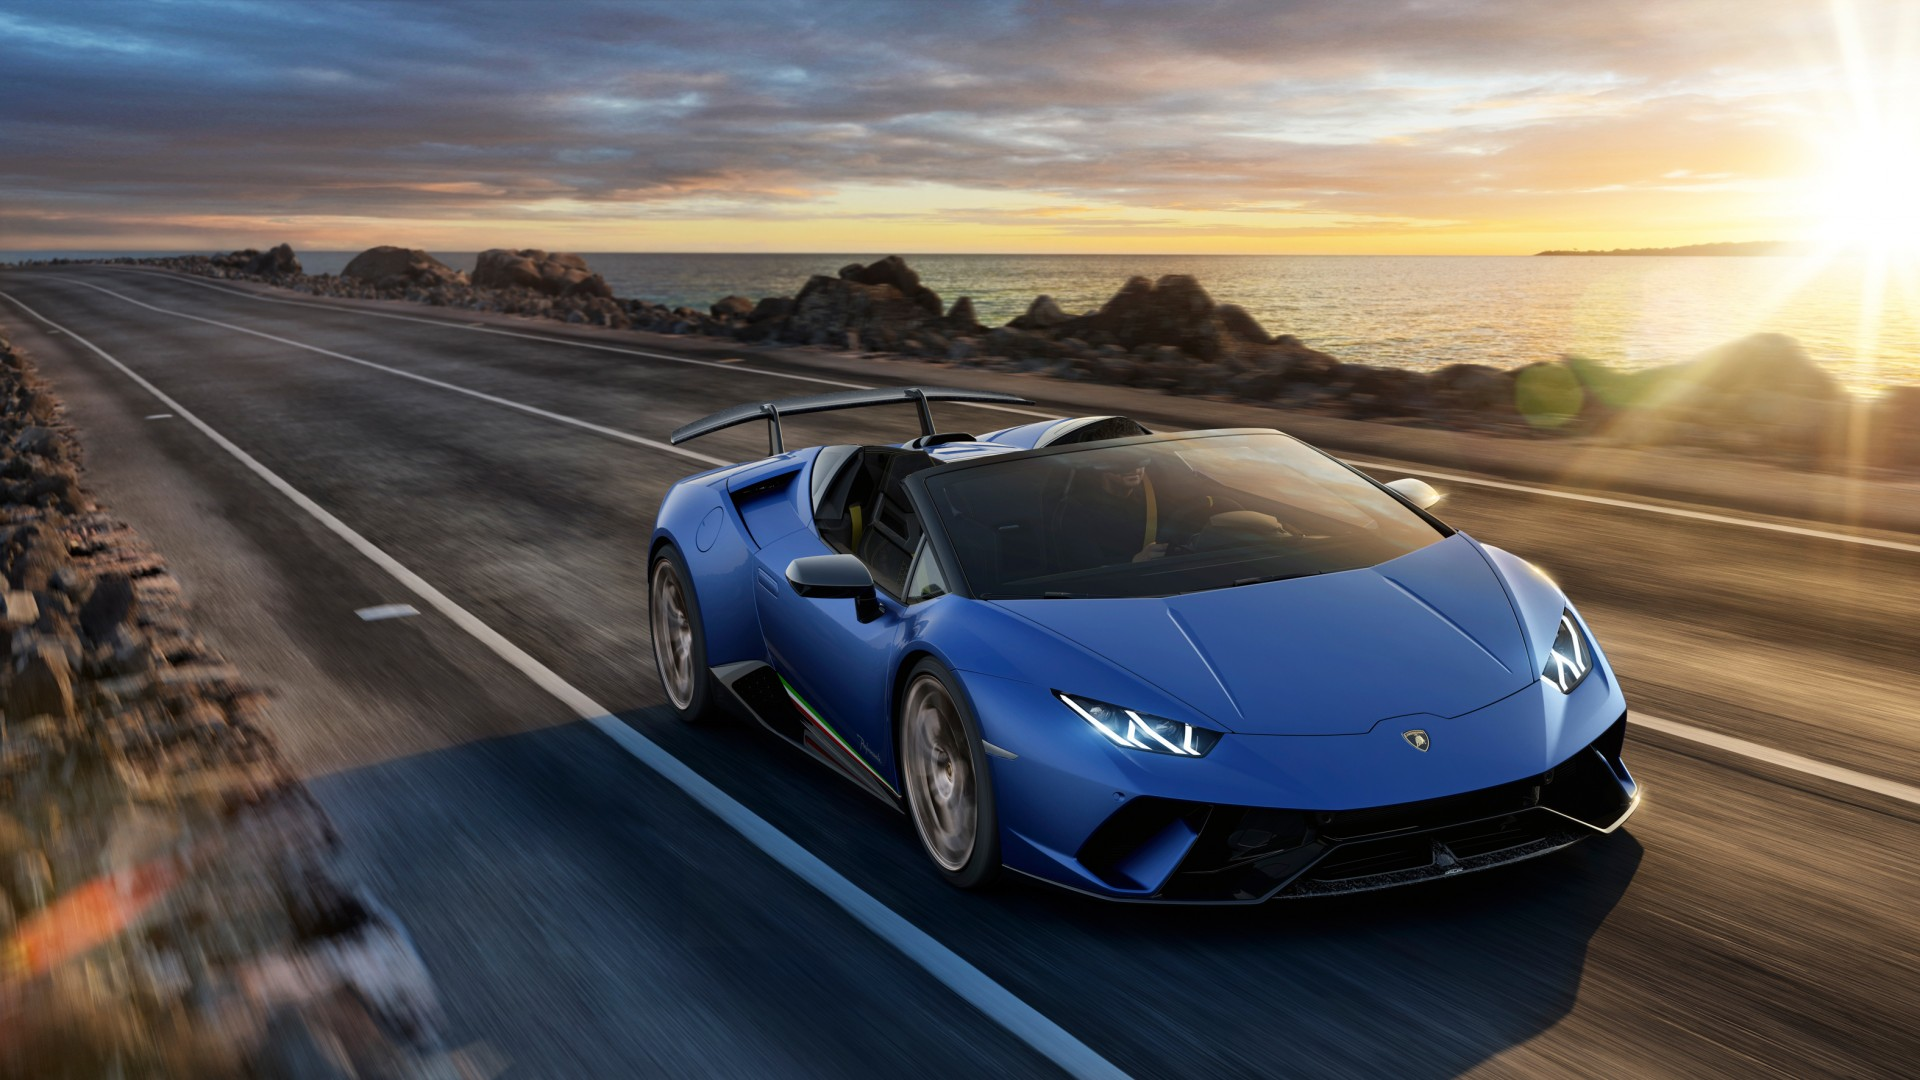 2018 Lamborghini Huracan Perfomante Spyder 2 Wallpaper